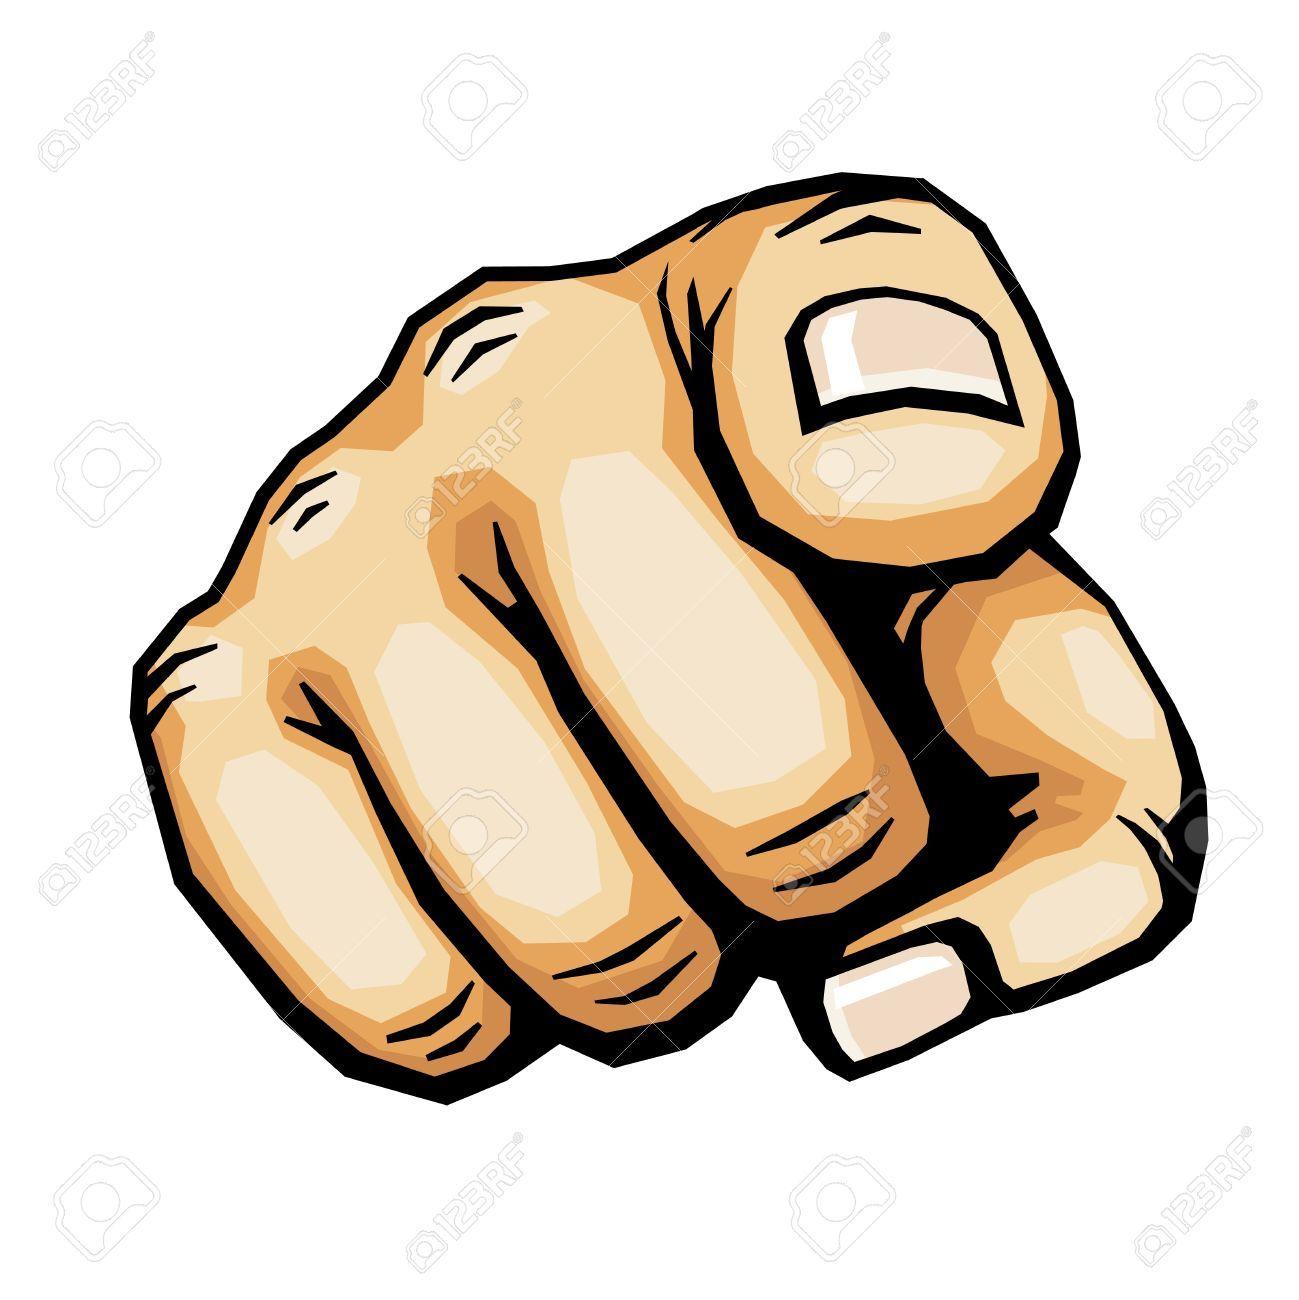 Devocional Para As Amigas Pointing Finger Apontar O Dedo Pointing Hand Love Smiley Brick Wall Drawing